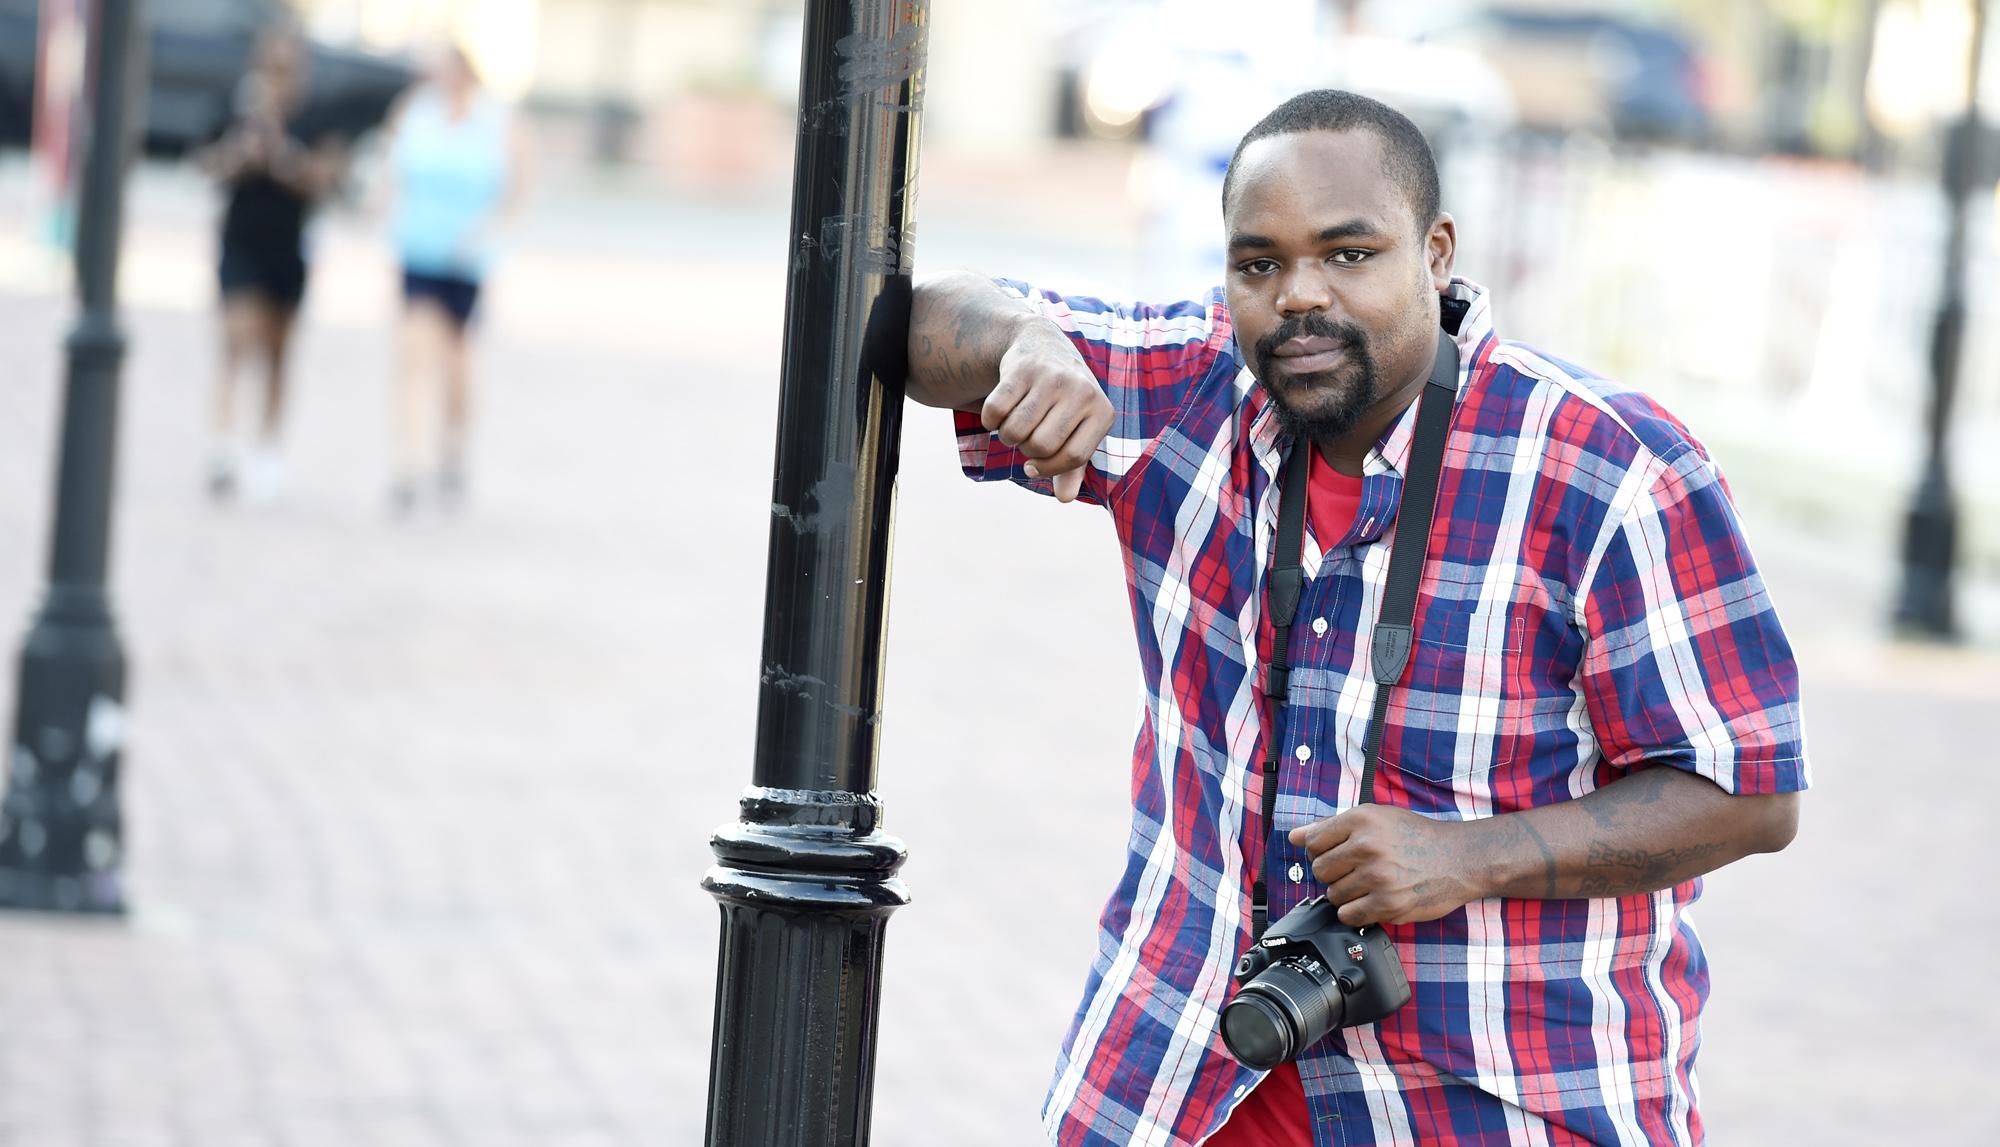 Wayne Johnson, Baltimore Street Photographer